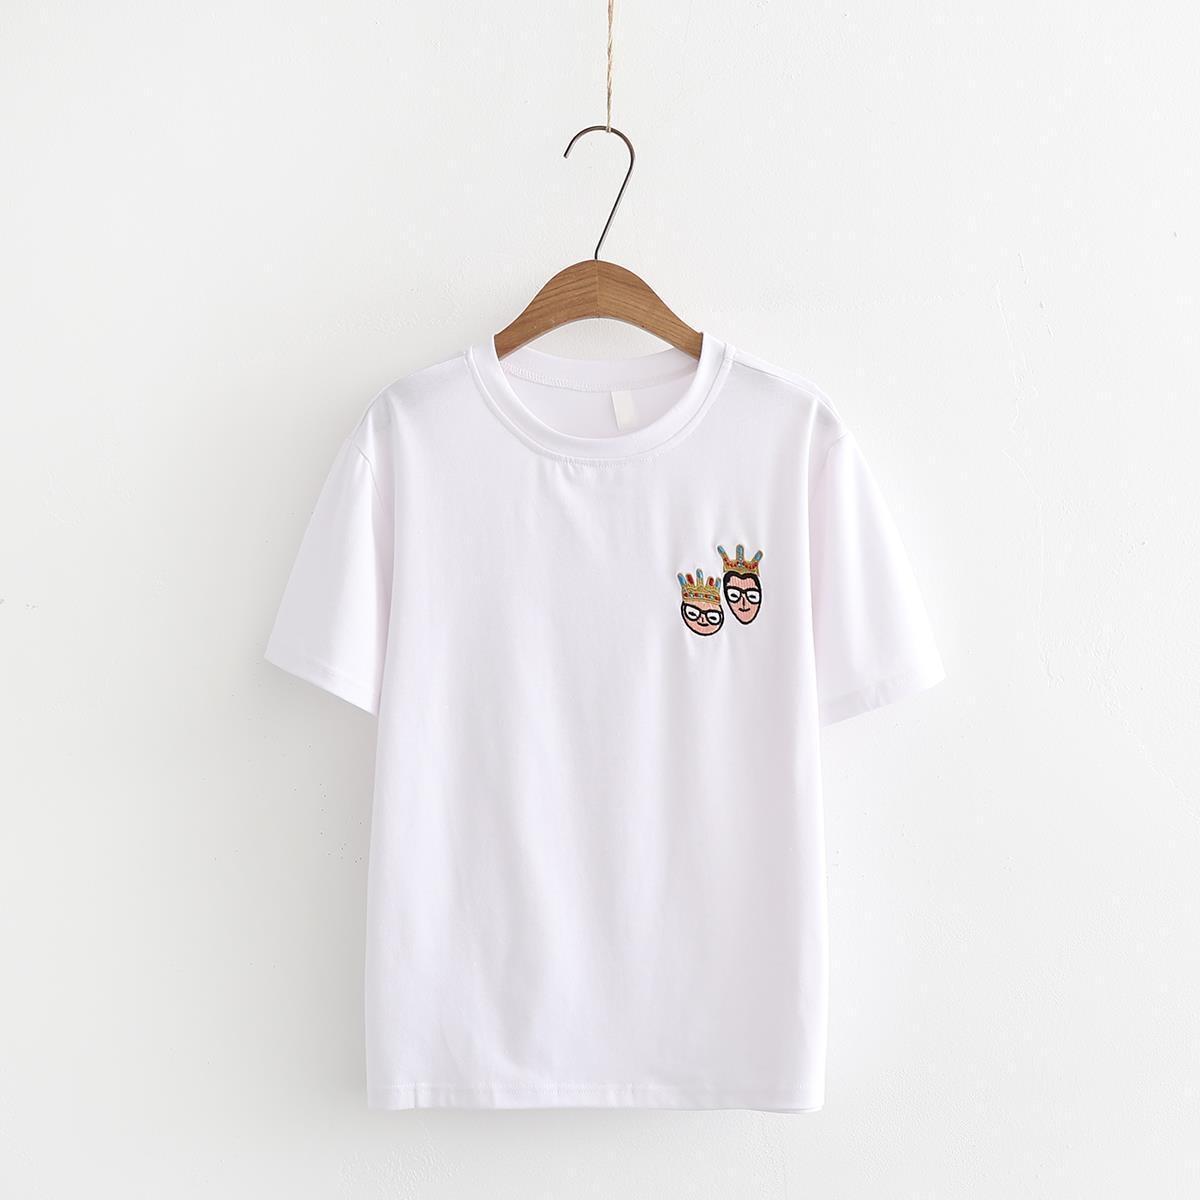 Camiseta de verano para mujer, Camisetas estampadas, Tops femeninos, camisetas de manga corta, camisetas